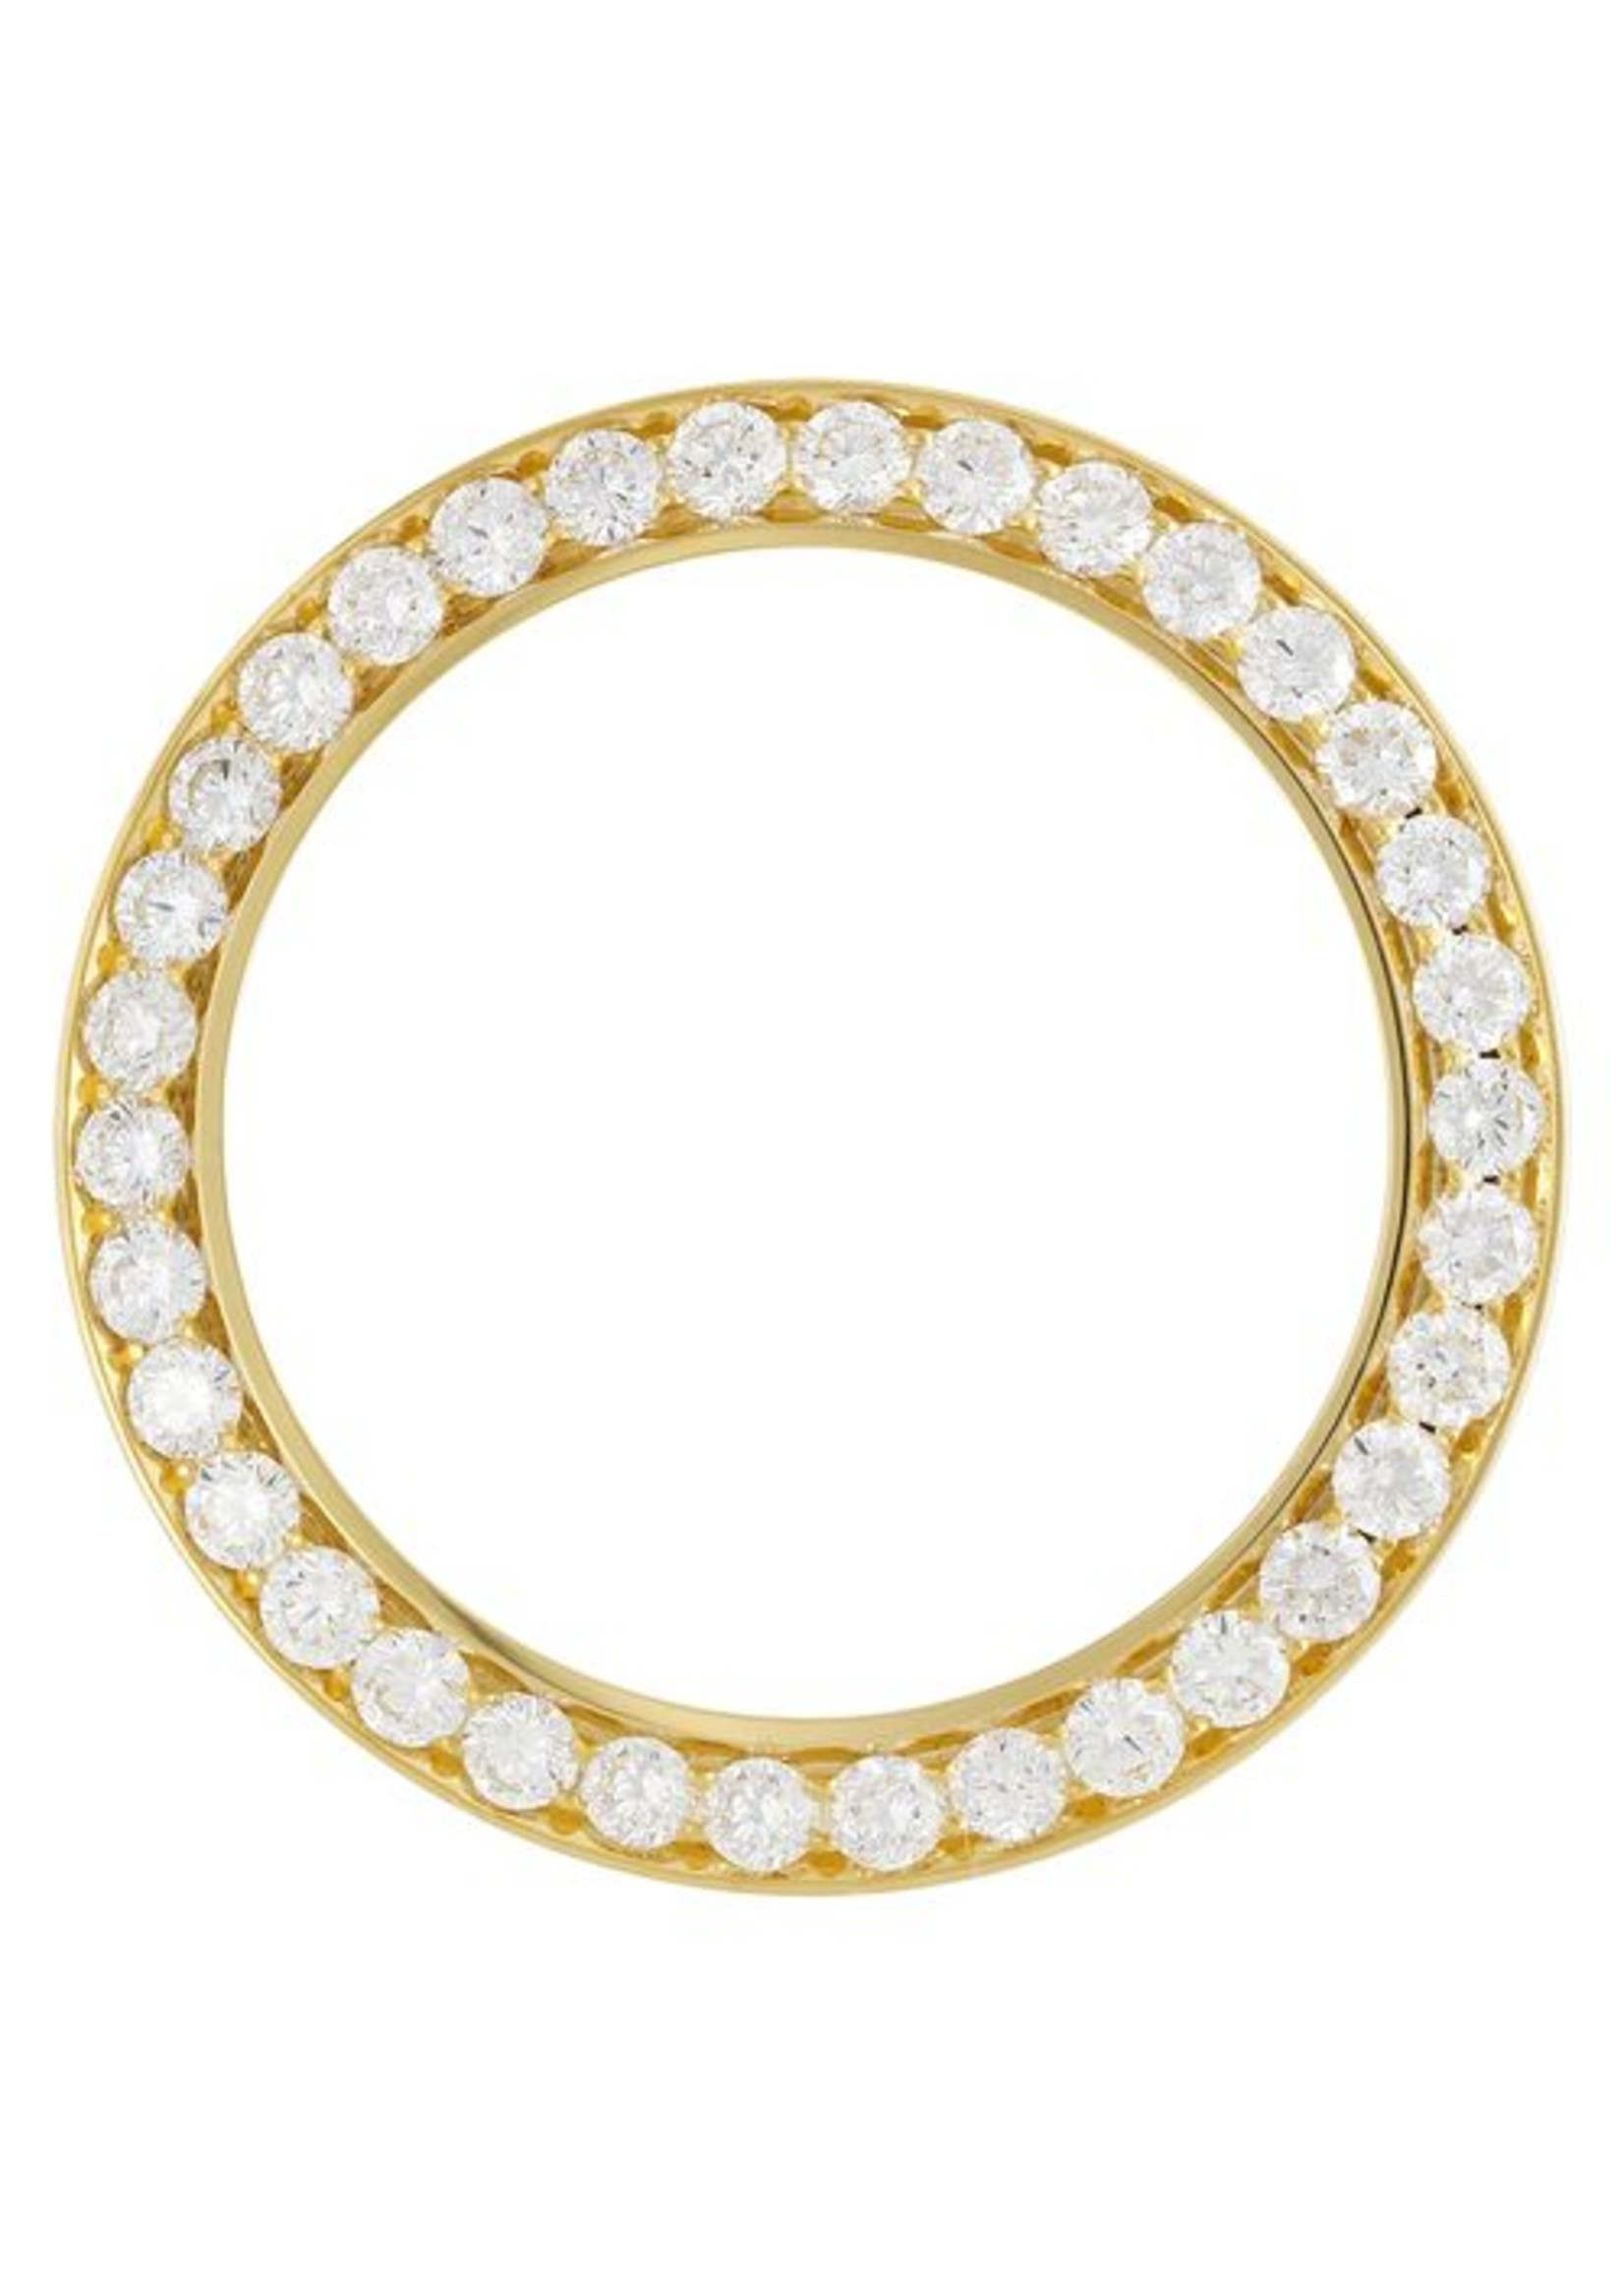 Rolex 3 Ct Diamond Bezel For Rolex Daydate II 2 41mm